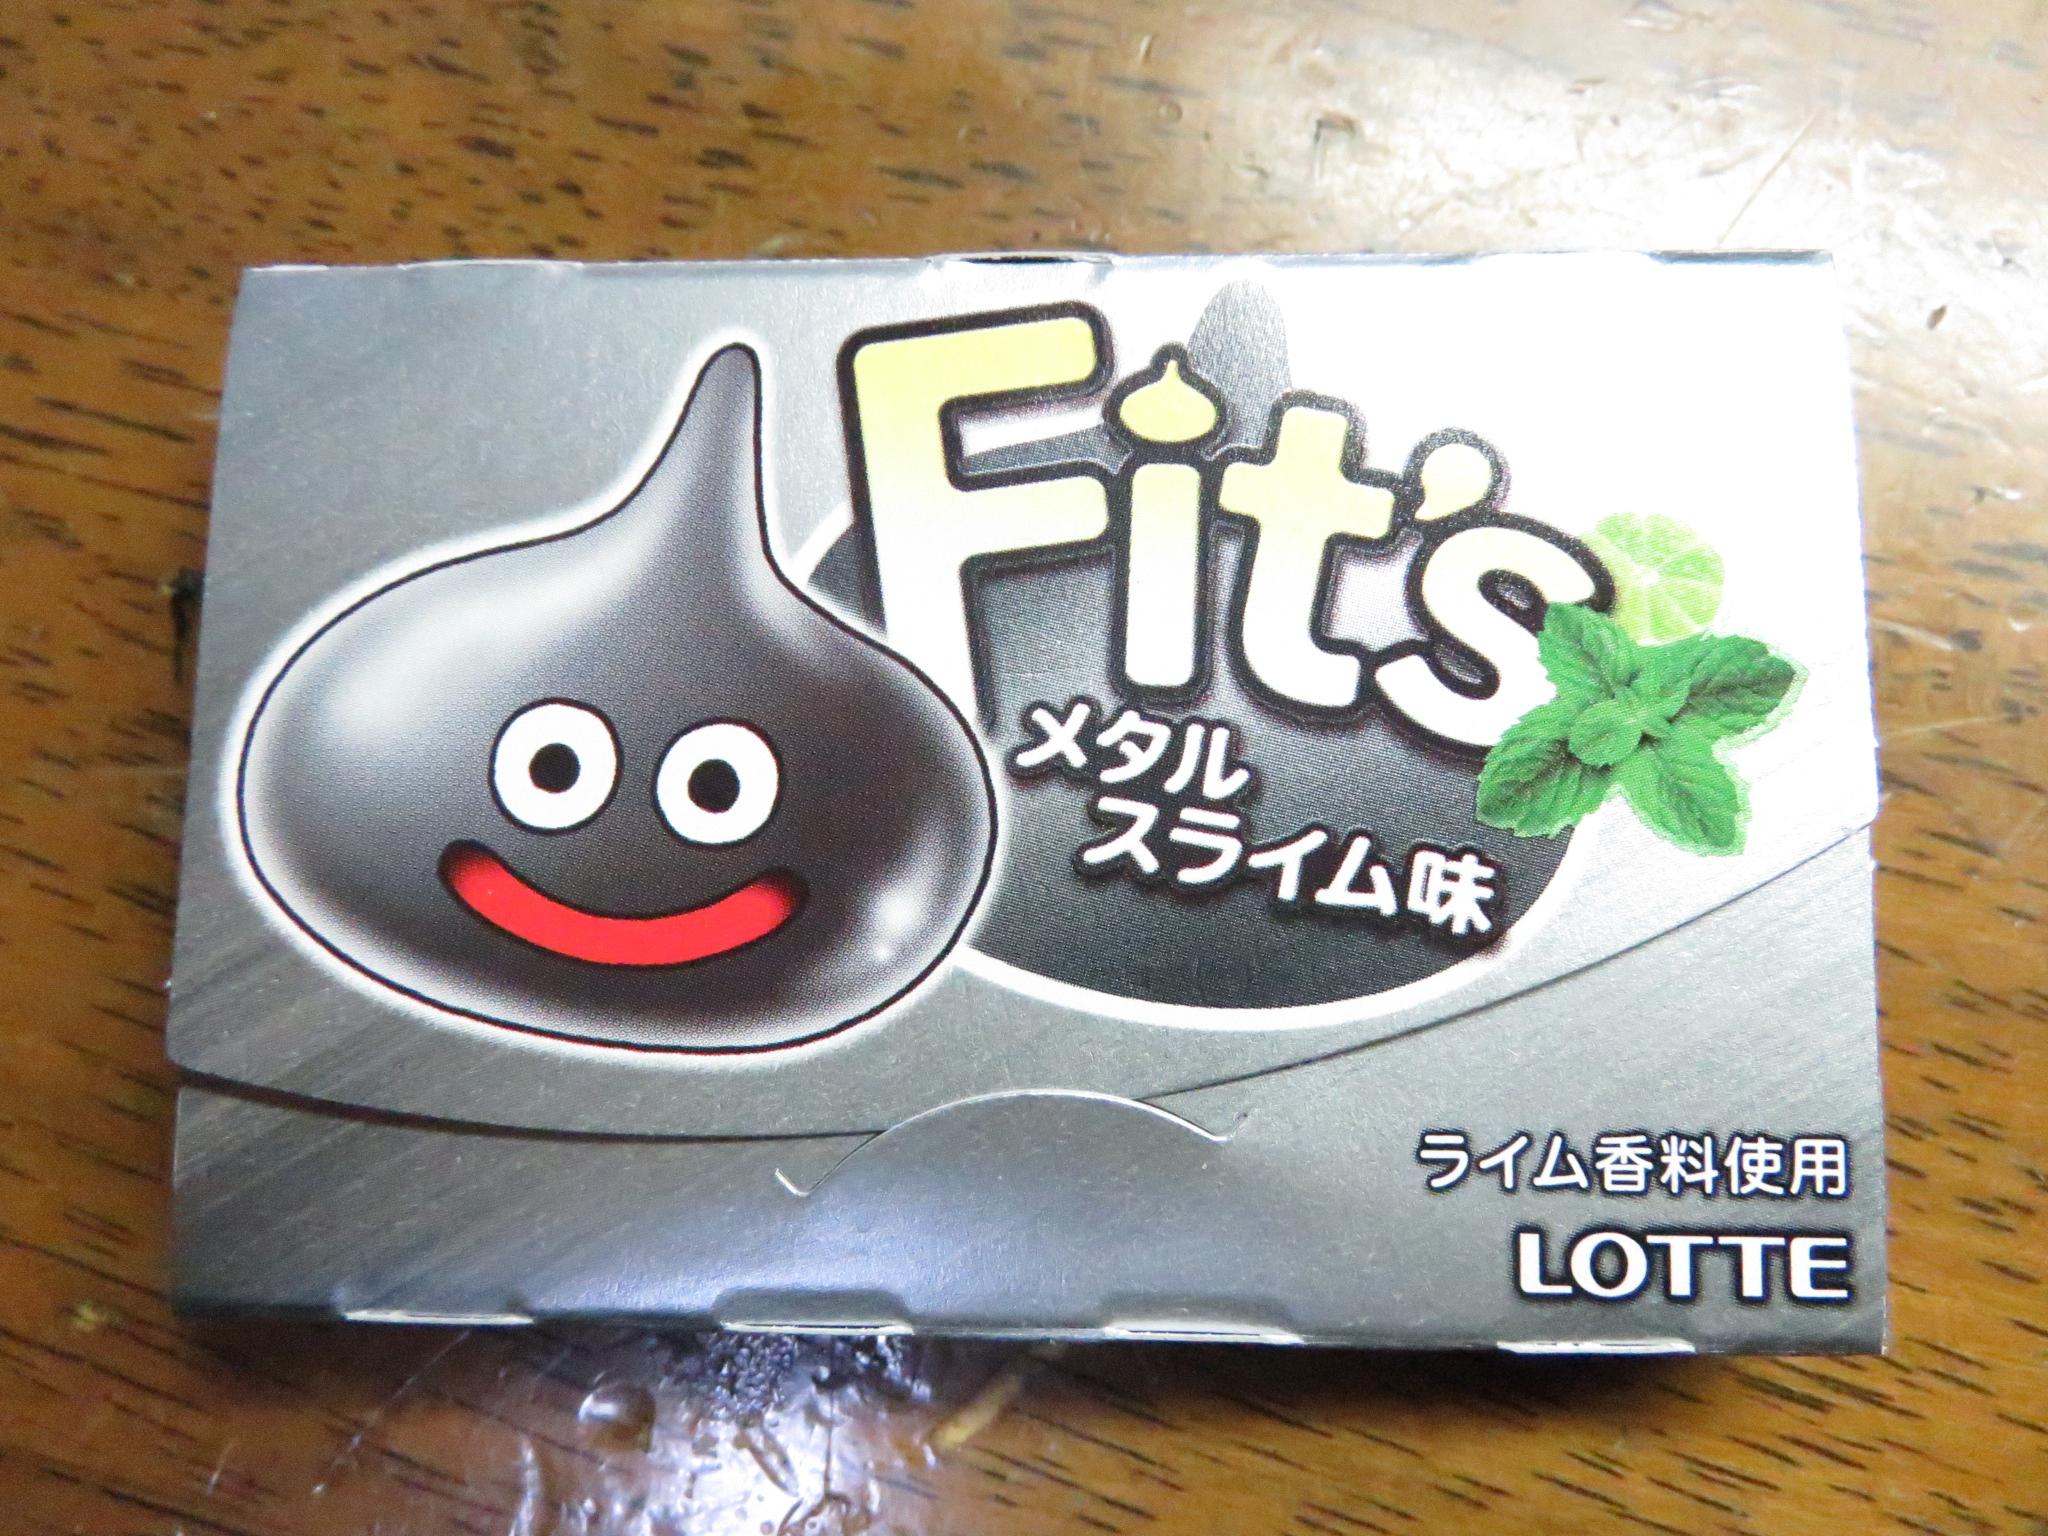 Fit's メタルスライム味